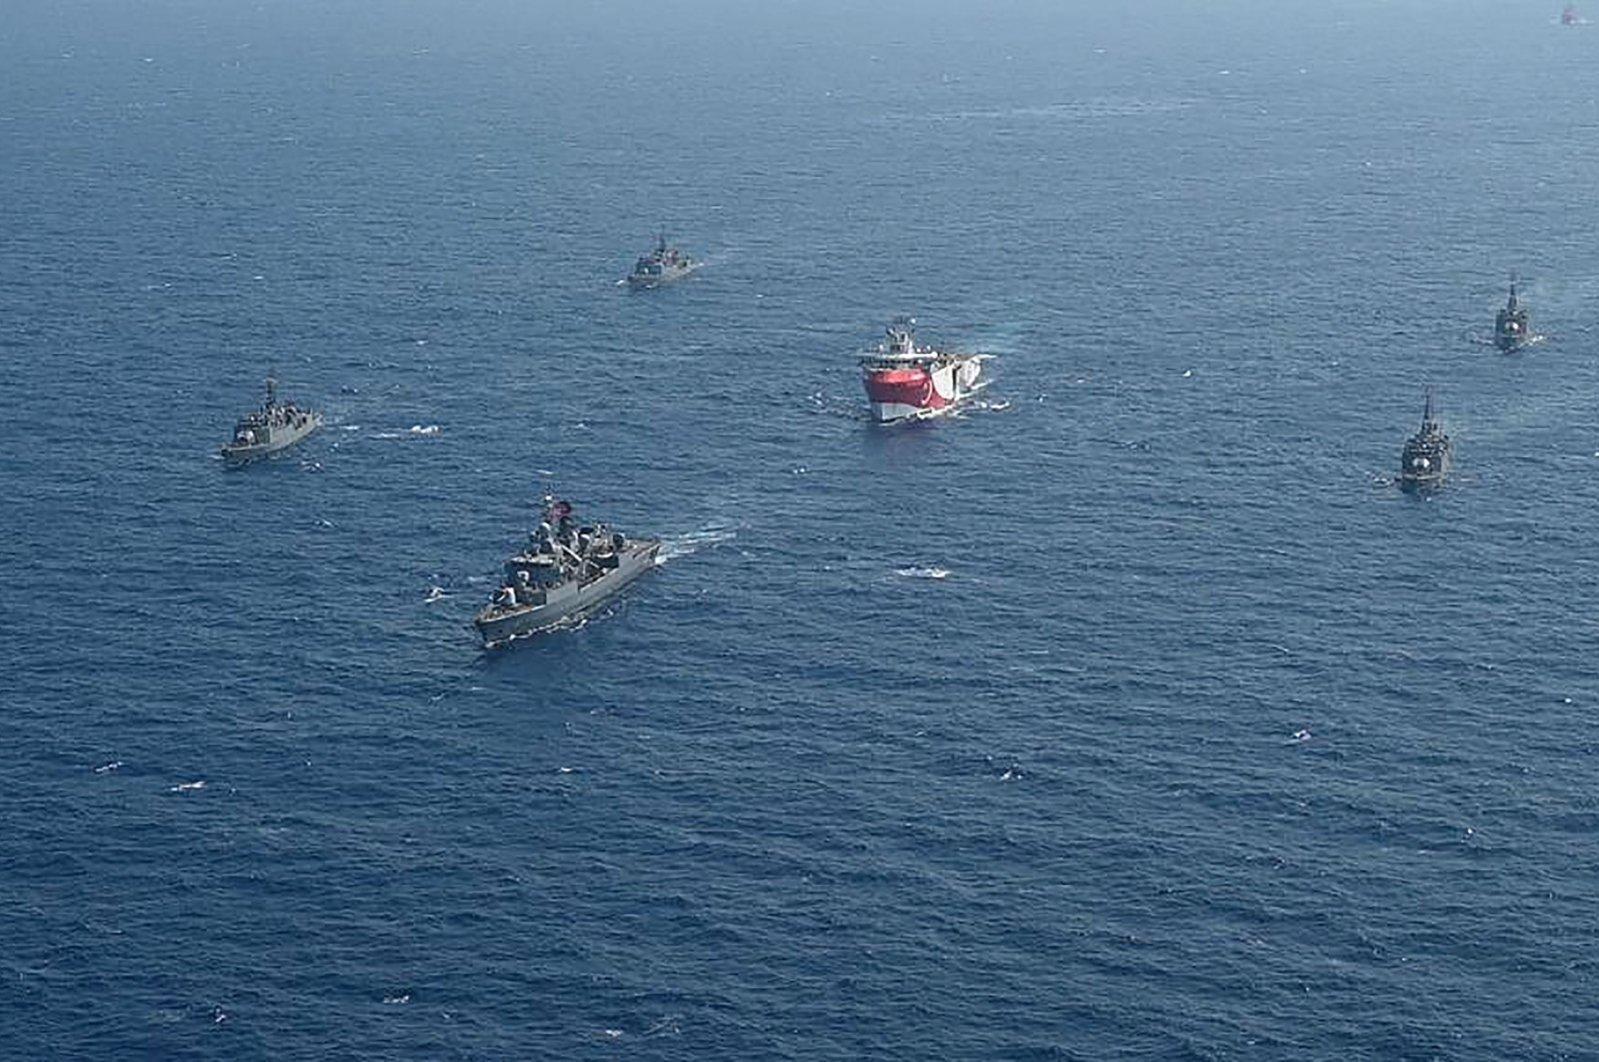 The Turkish seismic research vessel Oruç Reis is escorted by Turkish naval warships in the Mediterranean Sea off Antalya, Turkey, Aug. 10, 2020. (AFP Photo)